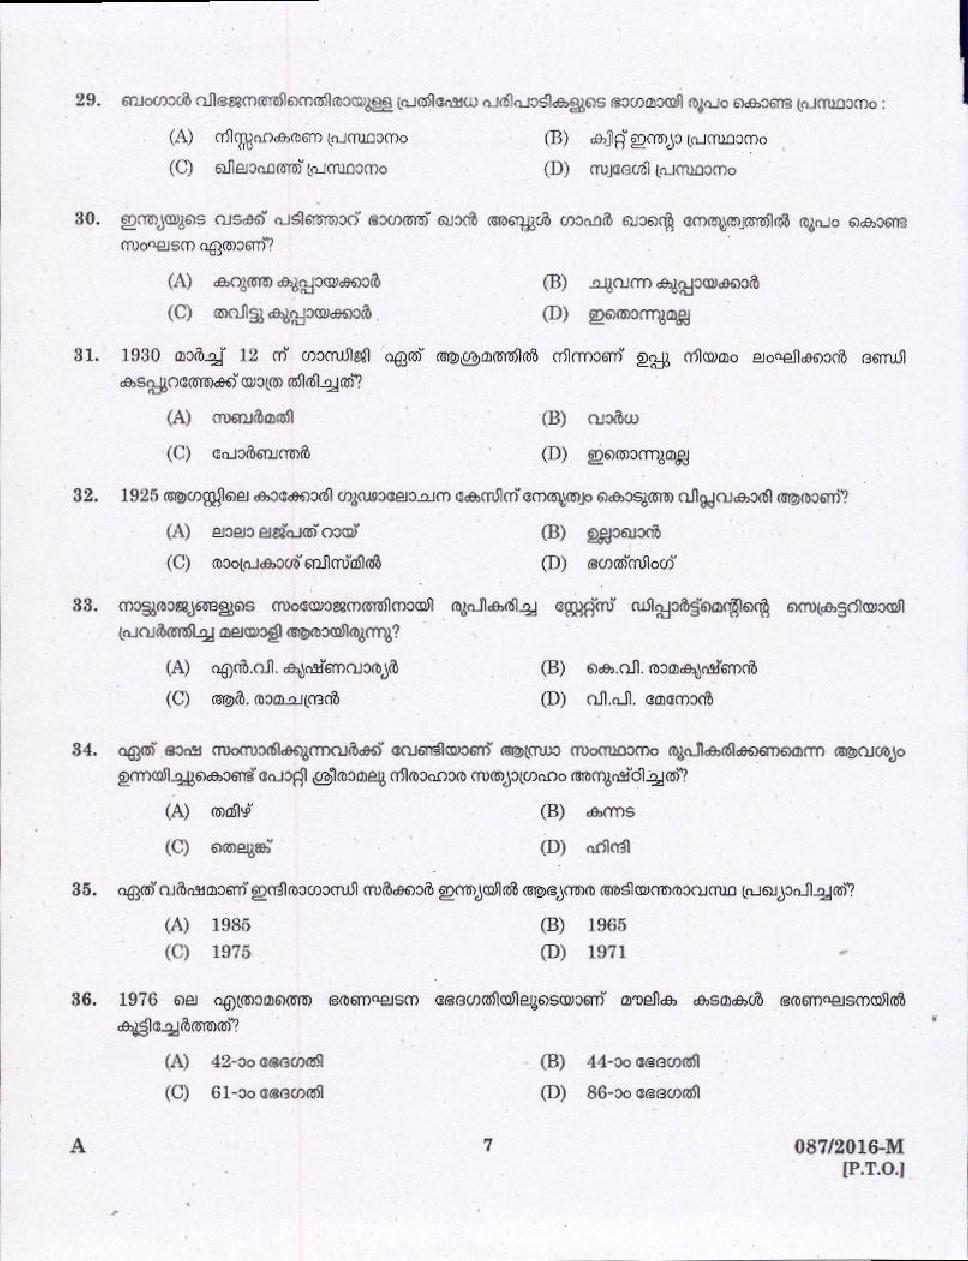 http://masterstudy.net//pdf/psc/village-extension-officer-gr-ii-rural-development/q_0872016-m0005.jpg